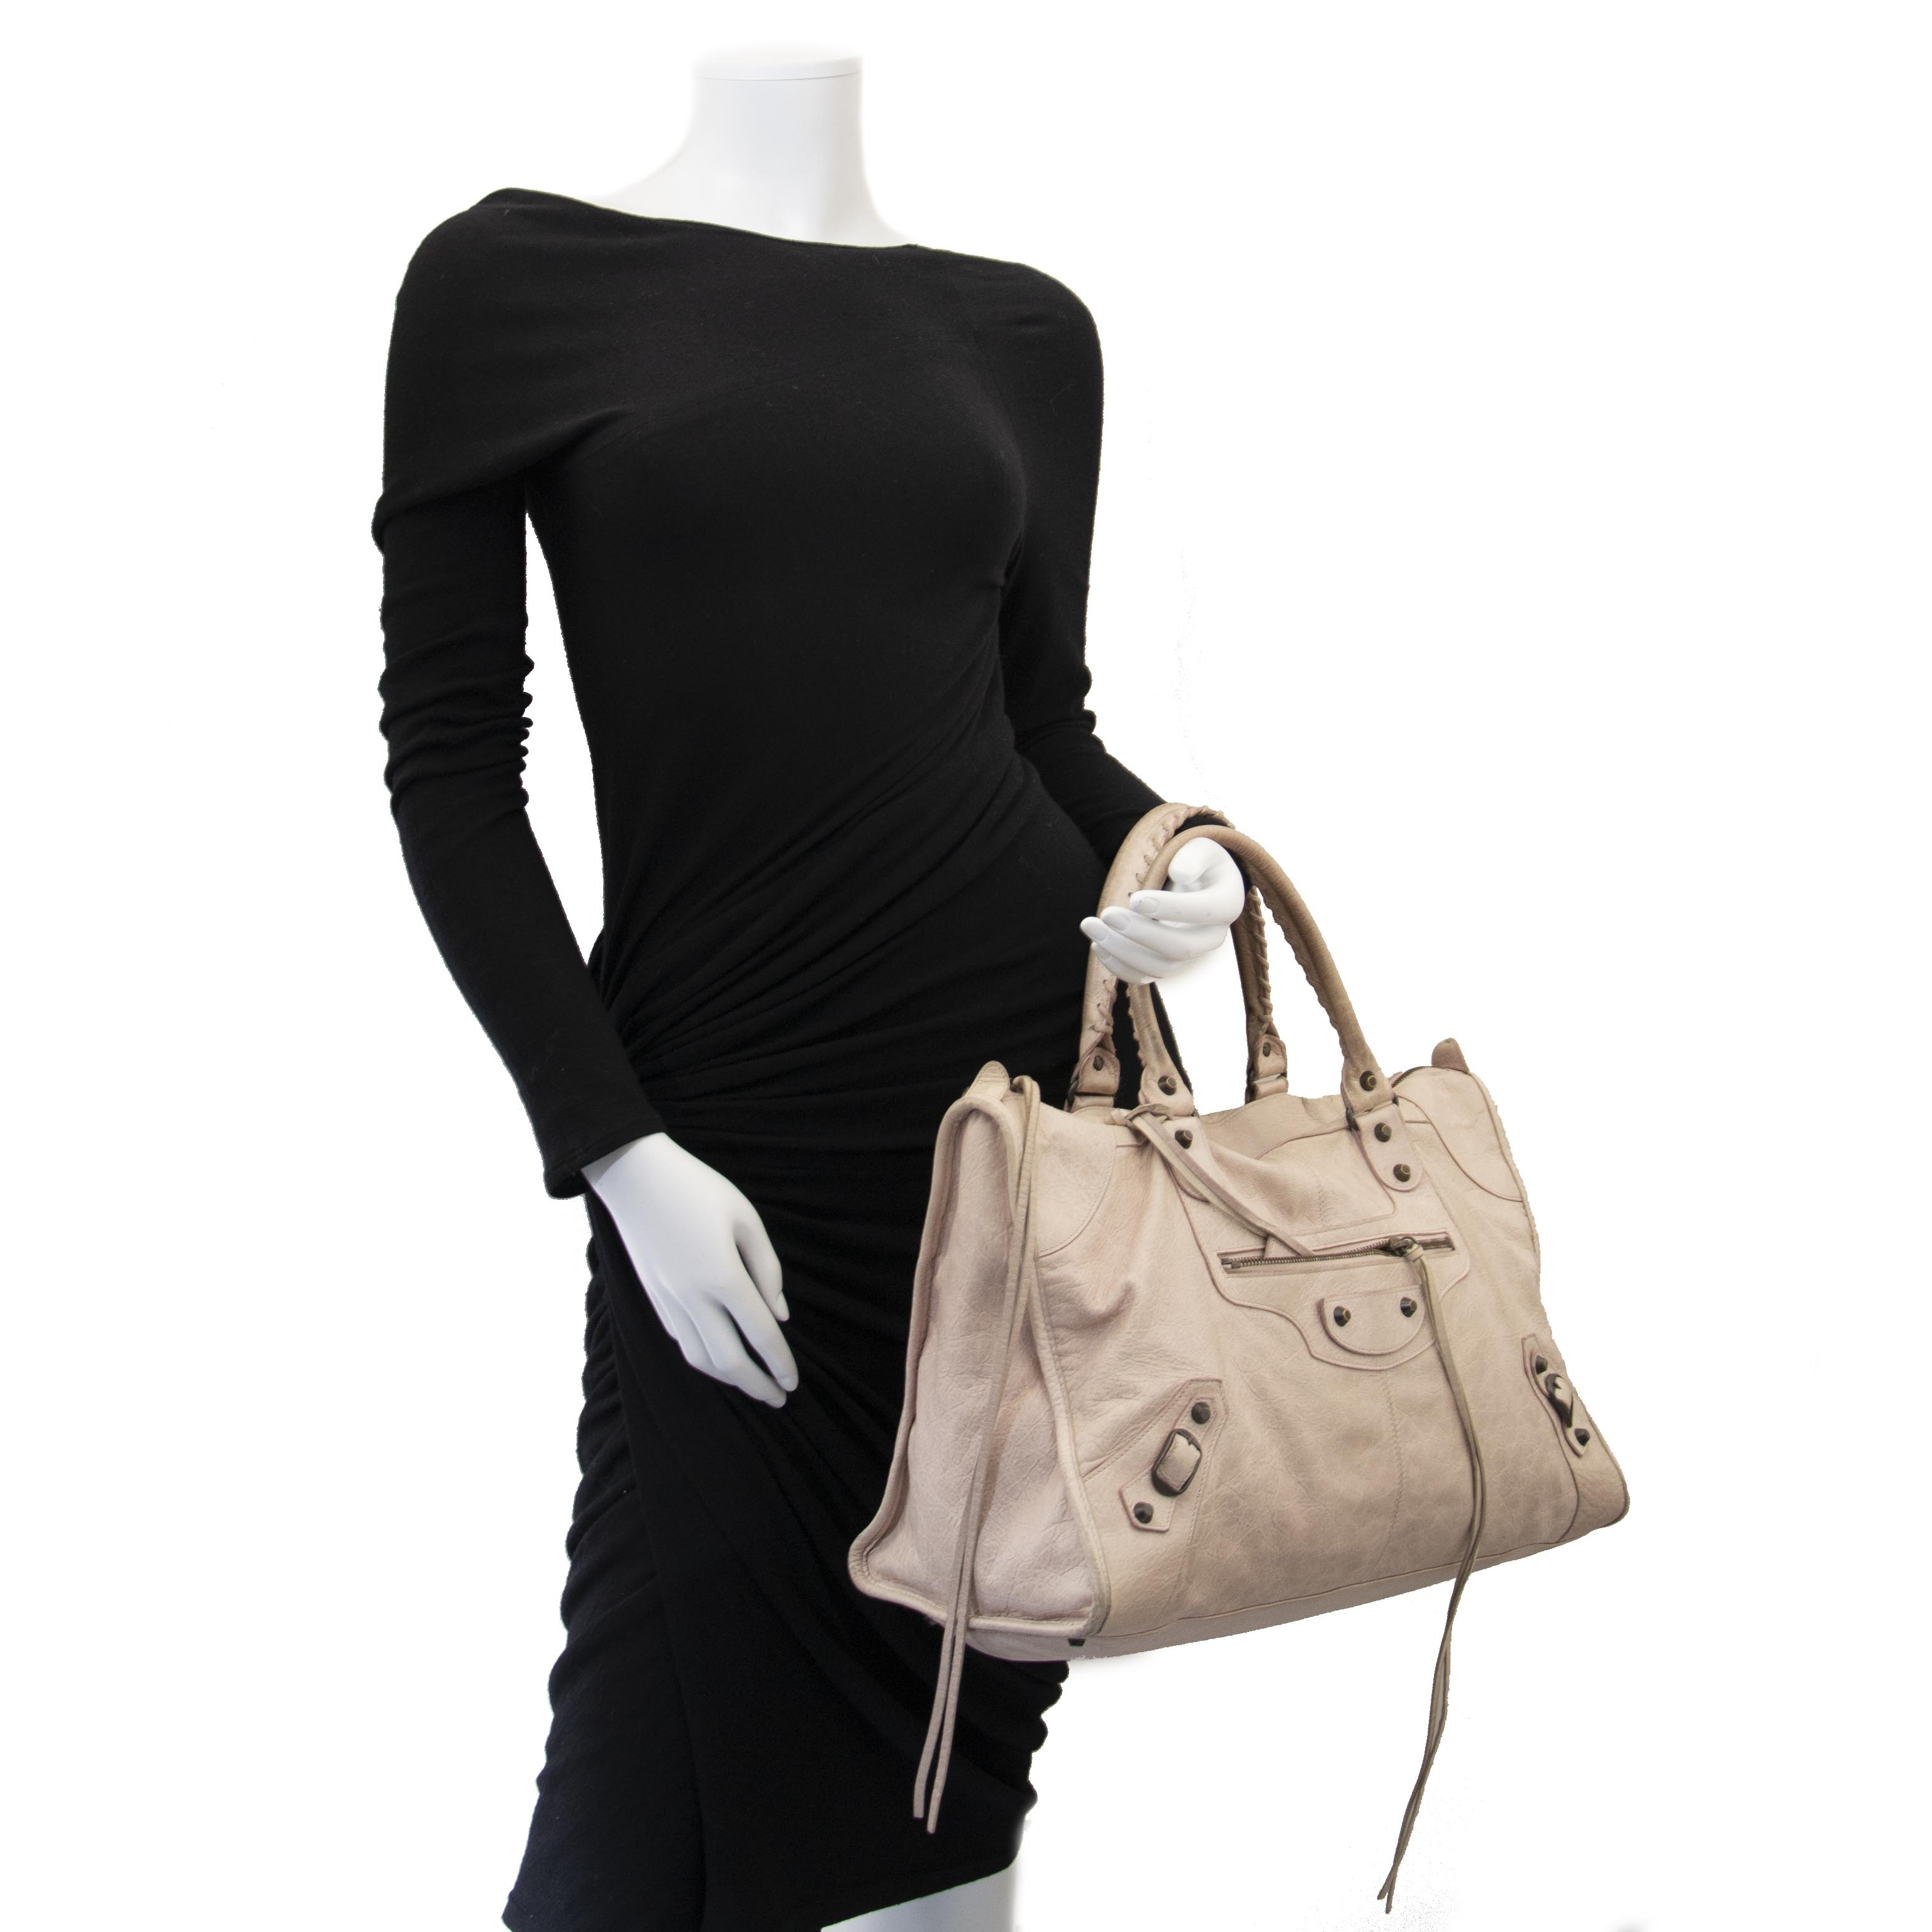 62ff846229d ... at Labellov Balenciaga Blush Pink Work Bag kopen en verkopen aan de  beste prijs bij Labellov